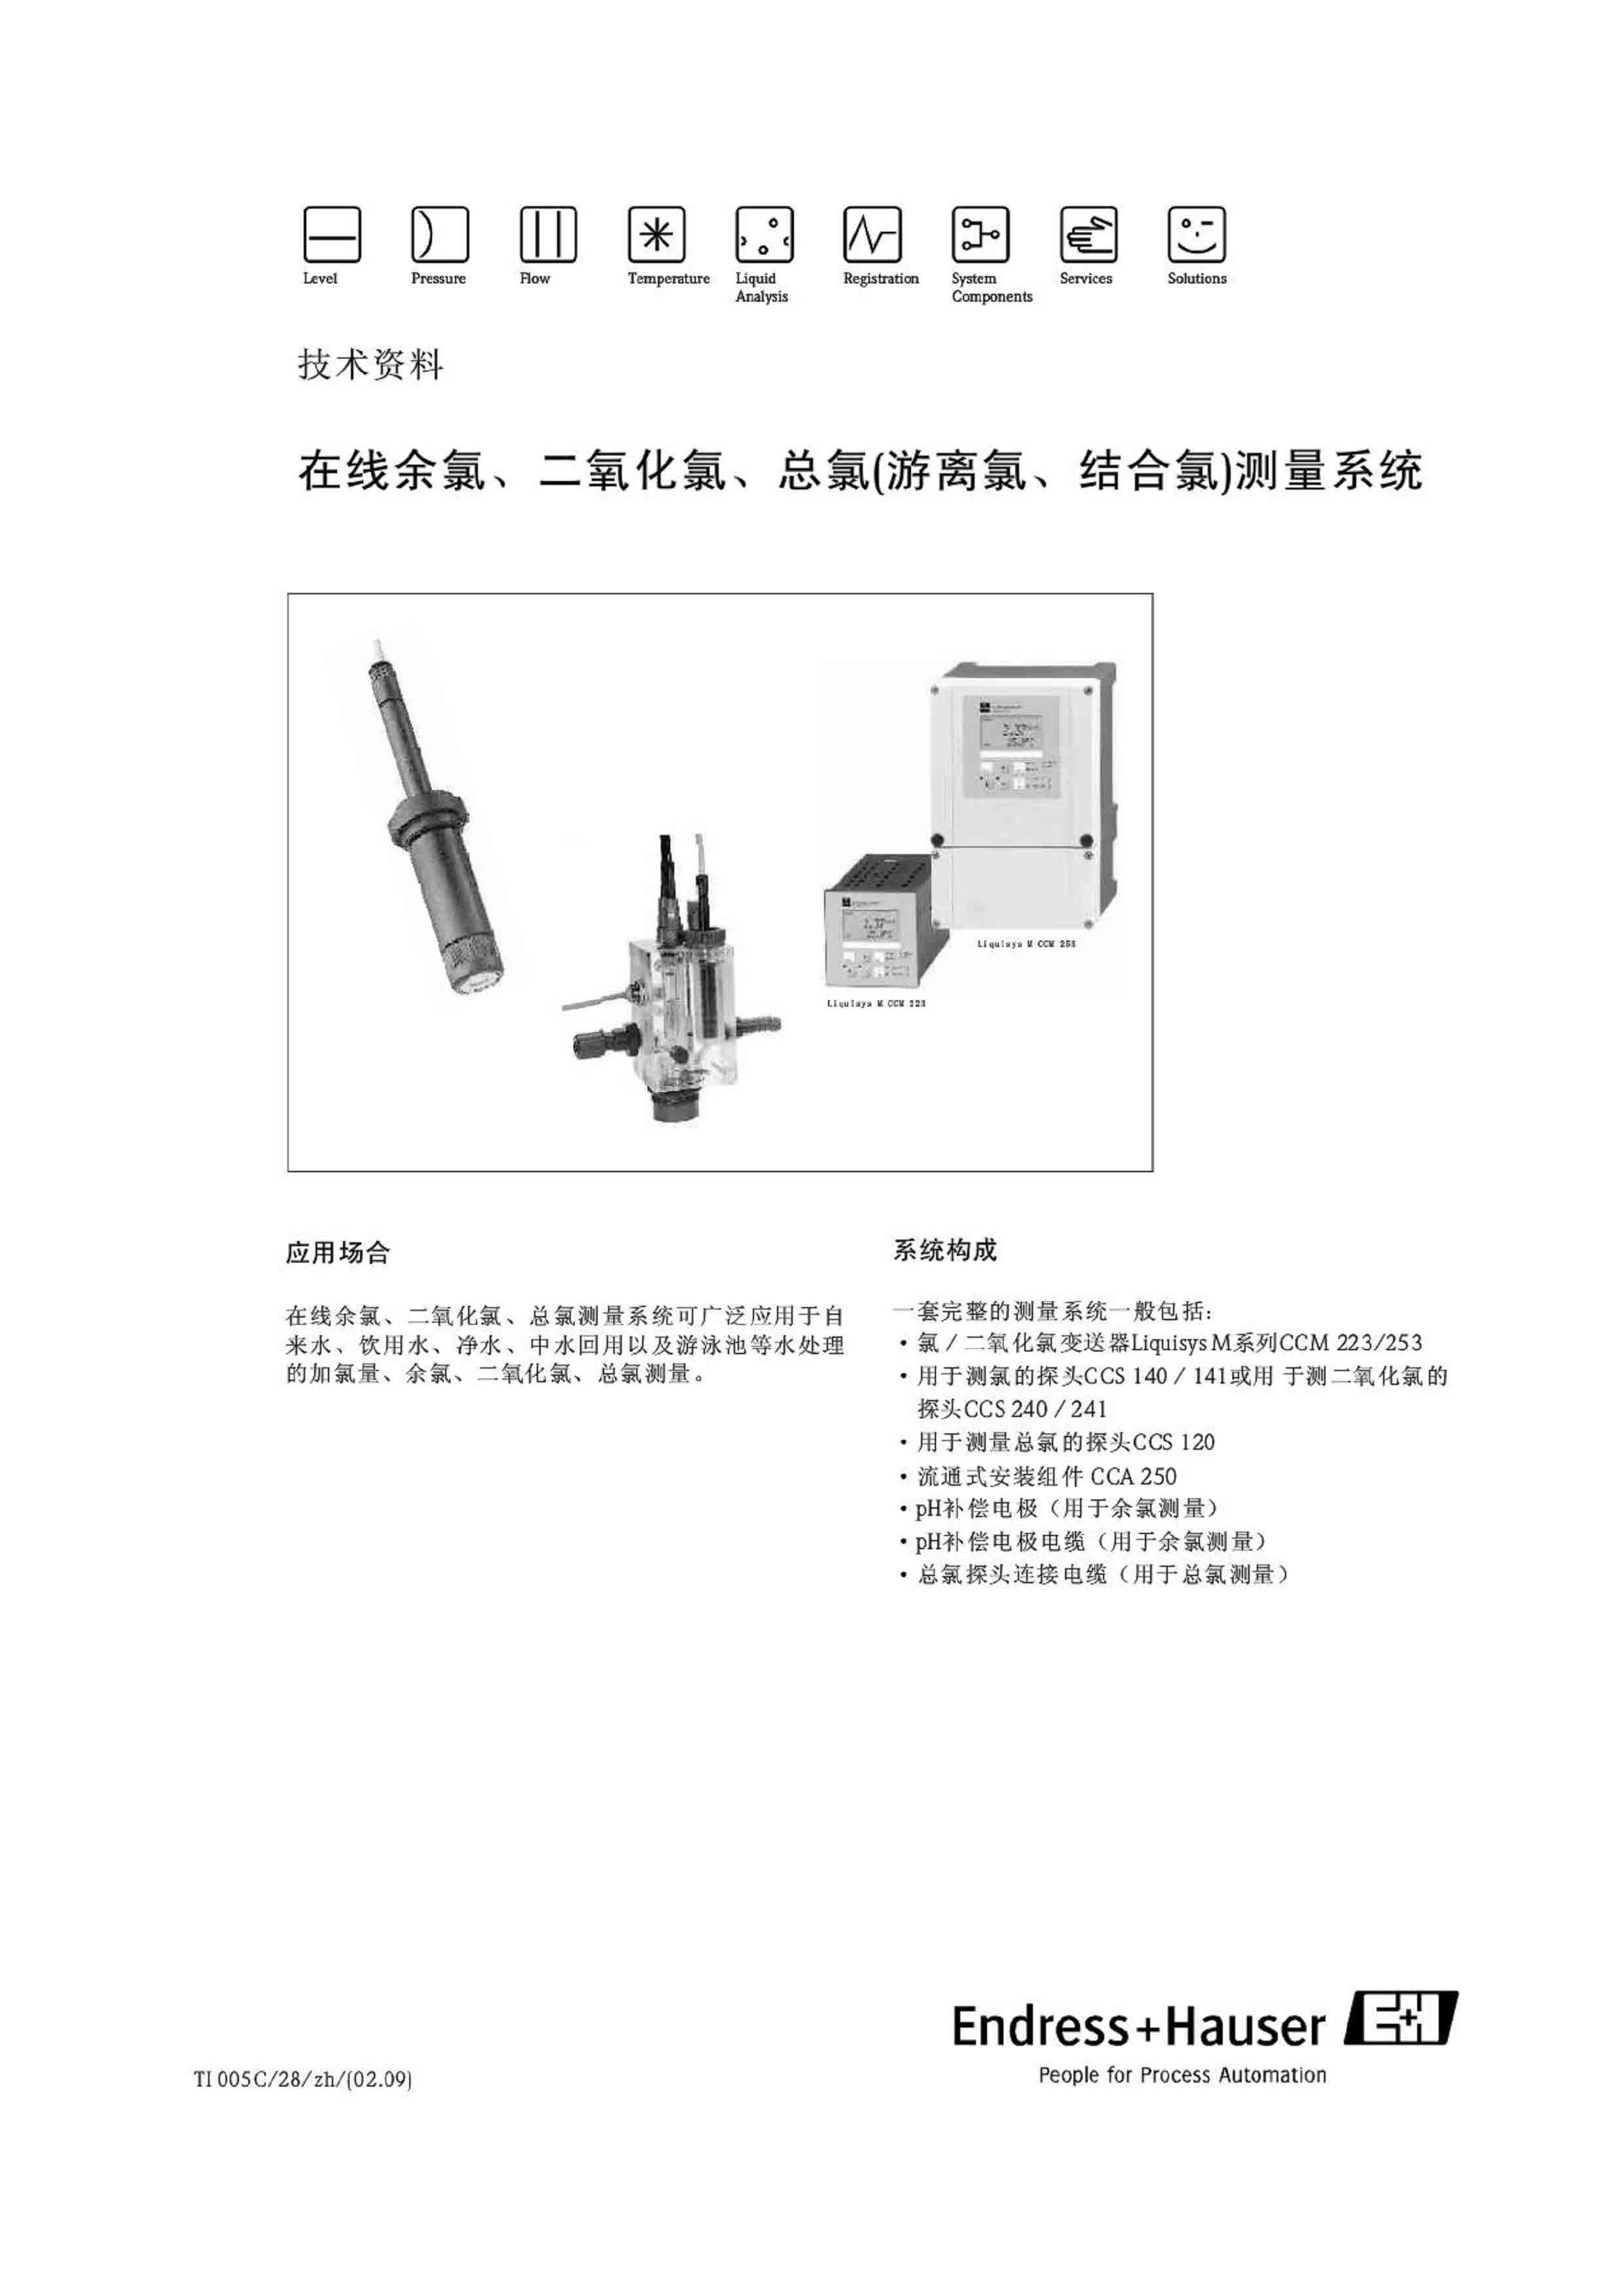 E+H余氯传感器CCS140_CCS141_CCS120技术手册